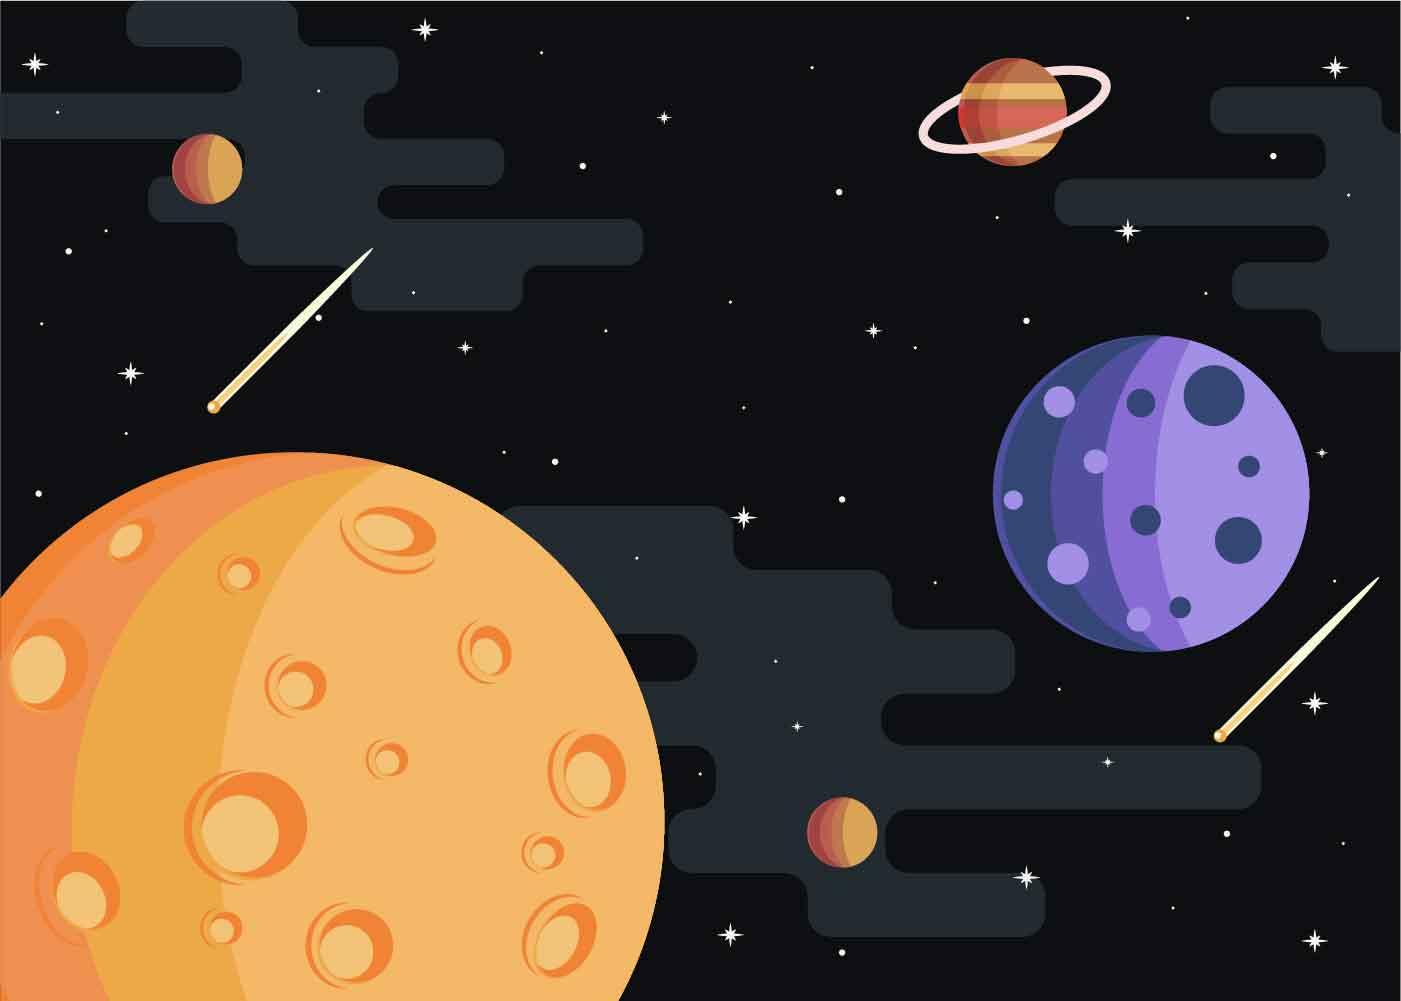 Moon Spacescape Illustration Vector Download Free Vector